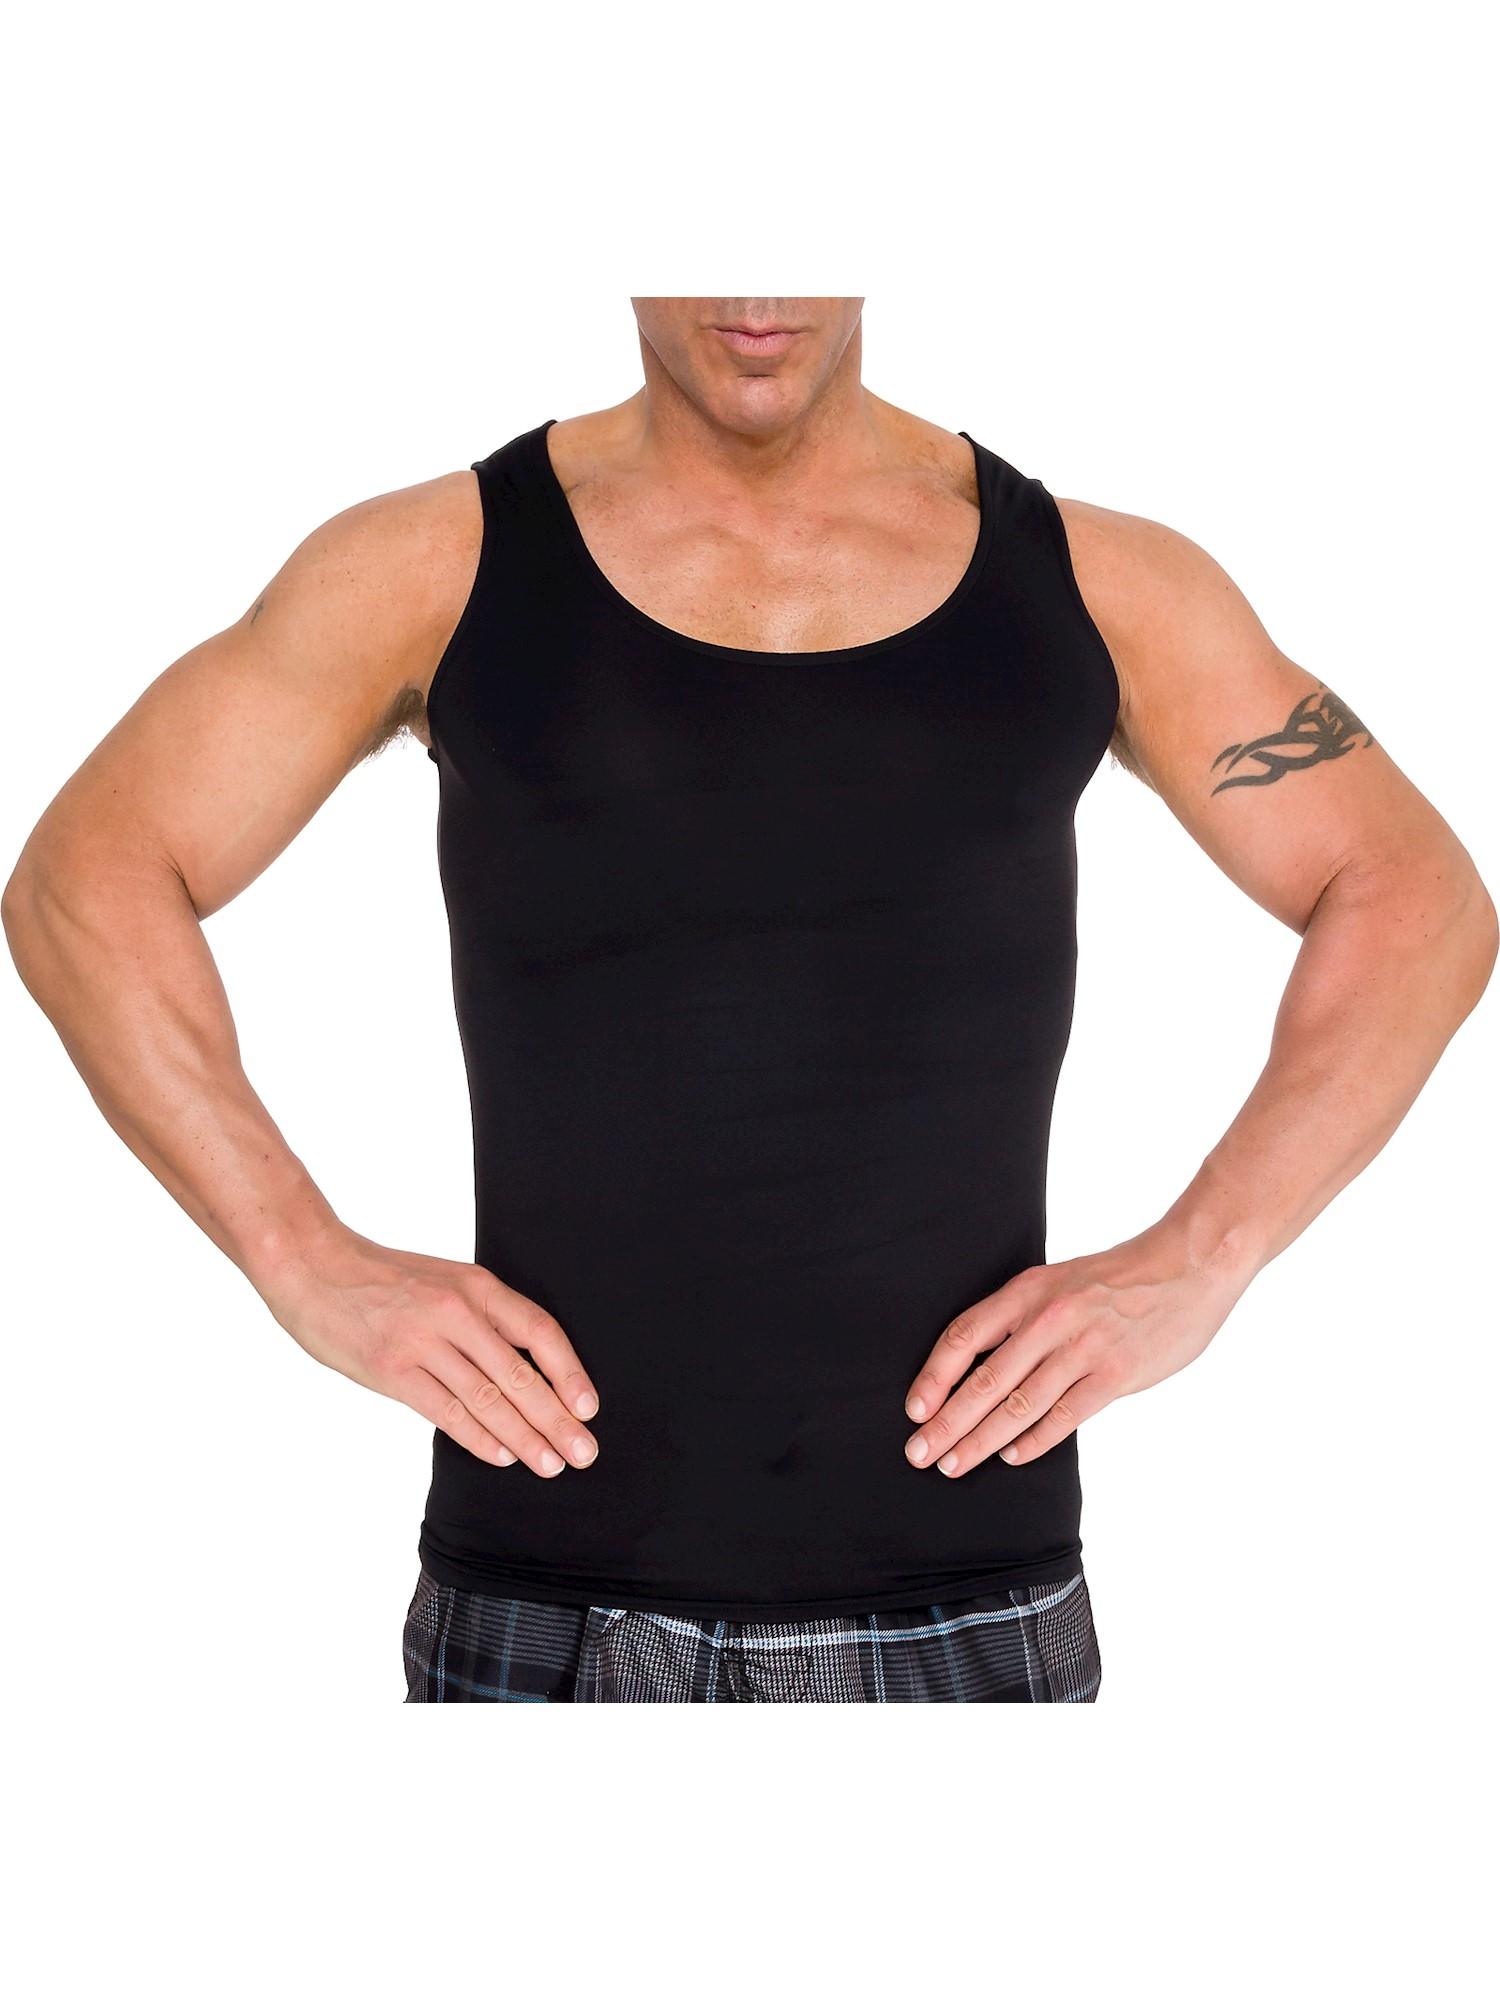 LISH Men's Slimming Compression Body Shaper Gynecomastia Undershirt Tank